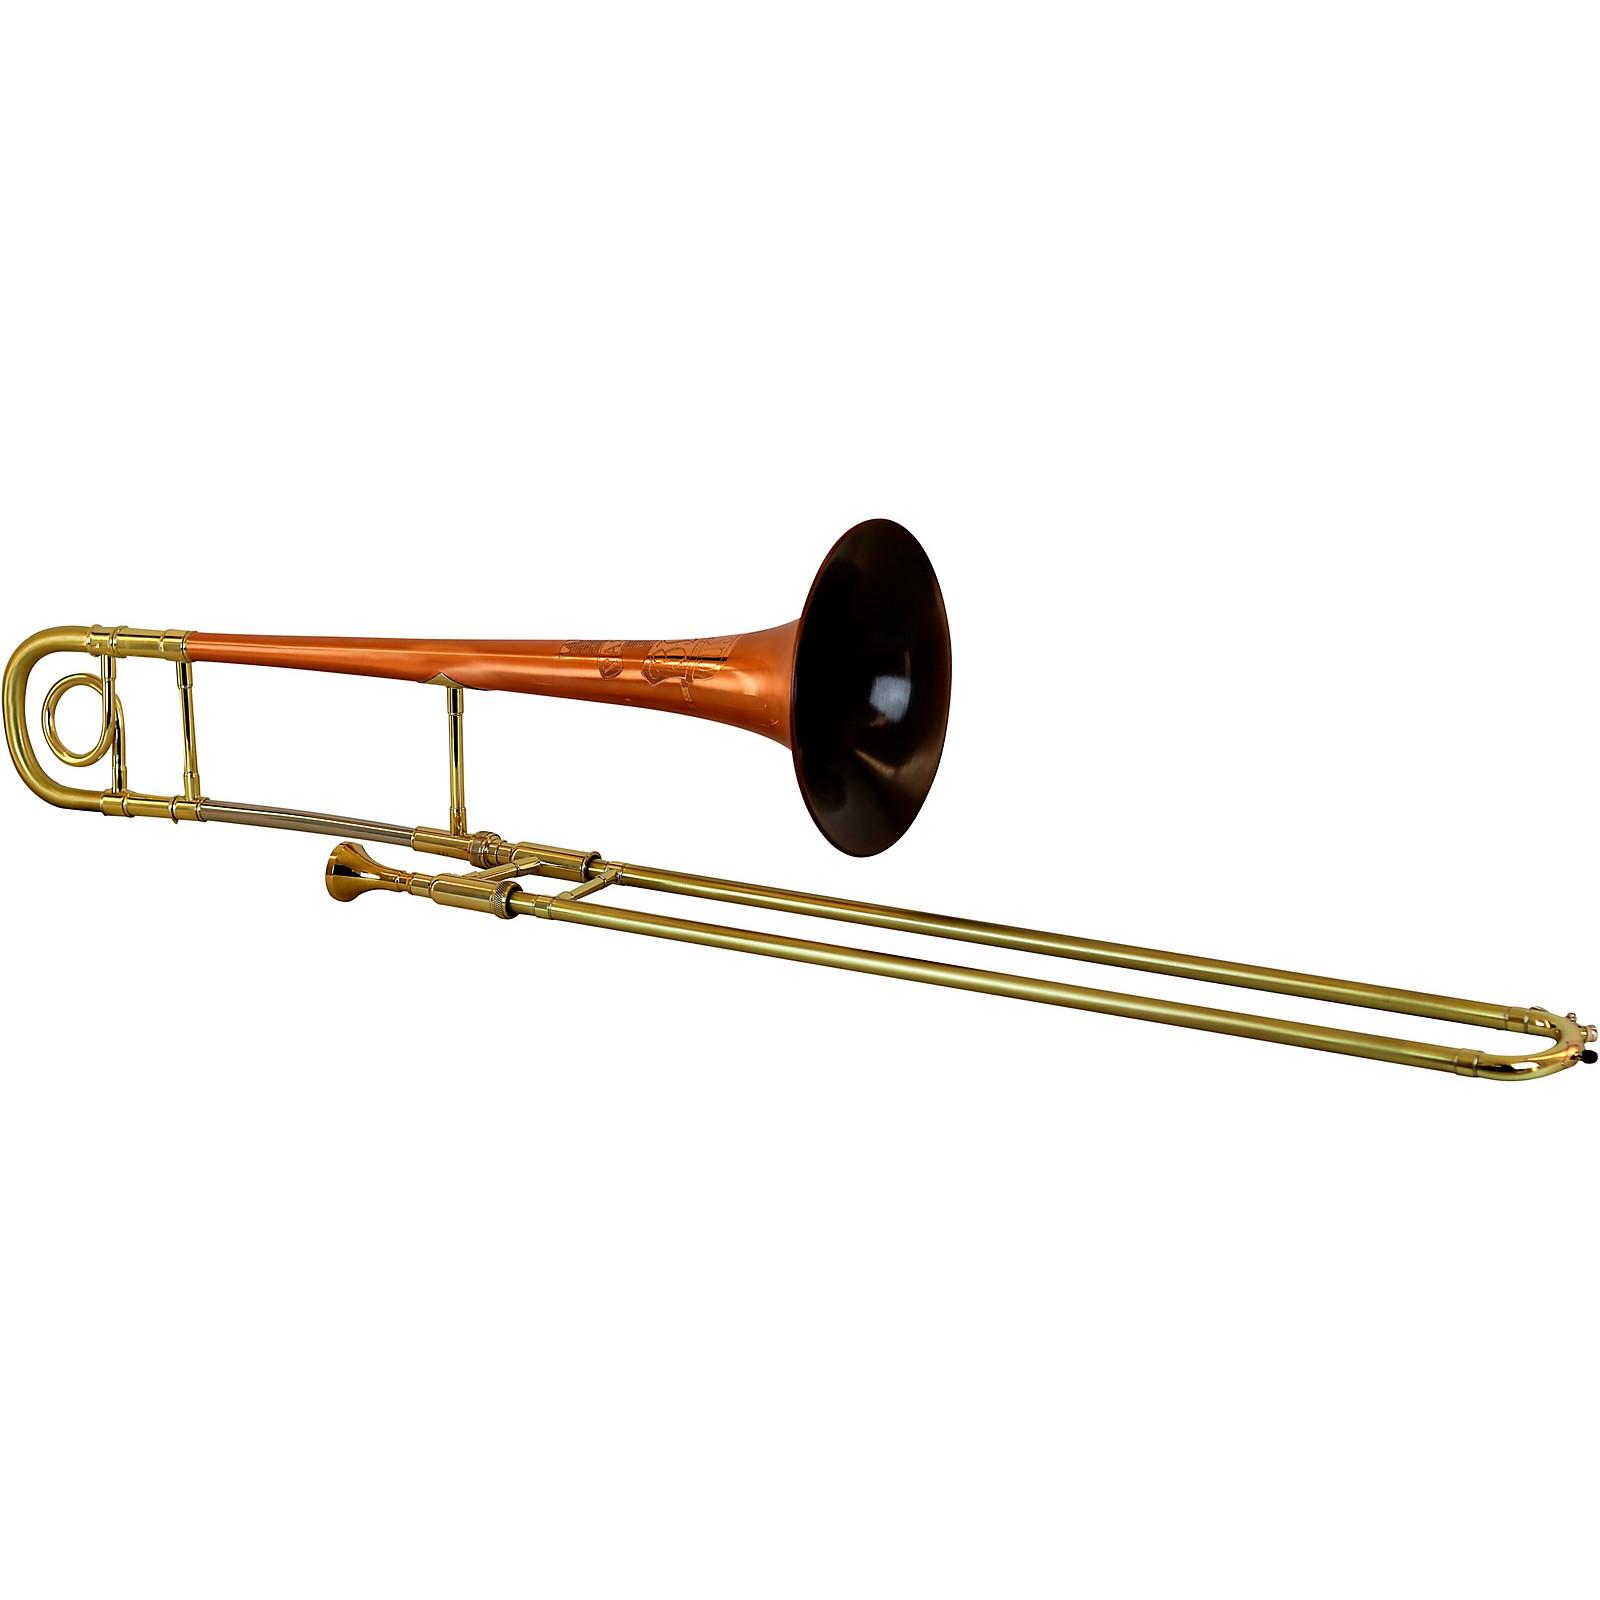 BAC Music Paseo Series Professional Trombone